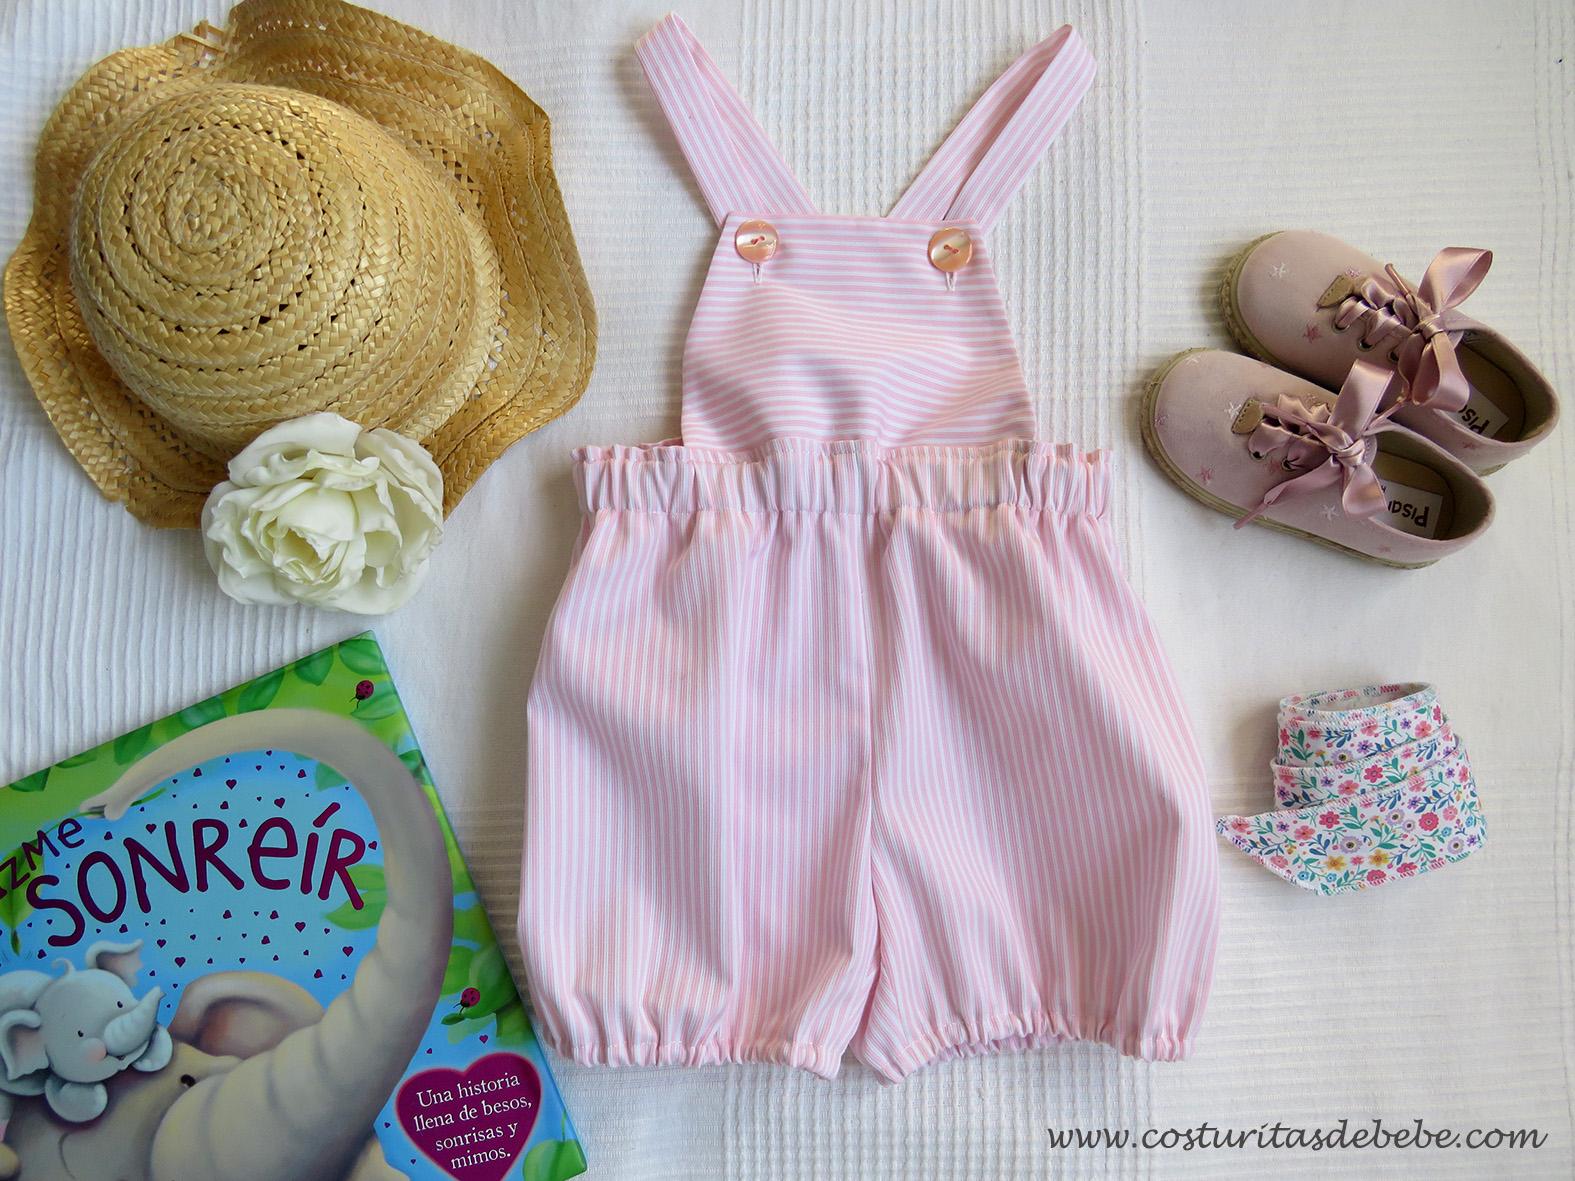 de Verano para reci/én Nacido Pijama para beb/é sin Mangas Carolilly Color Liso